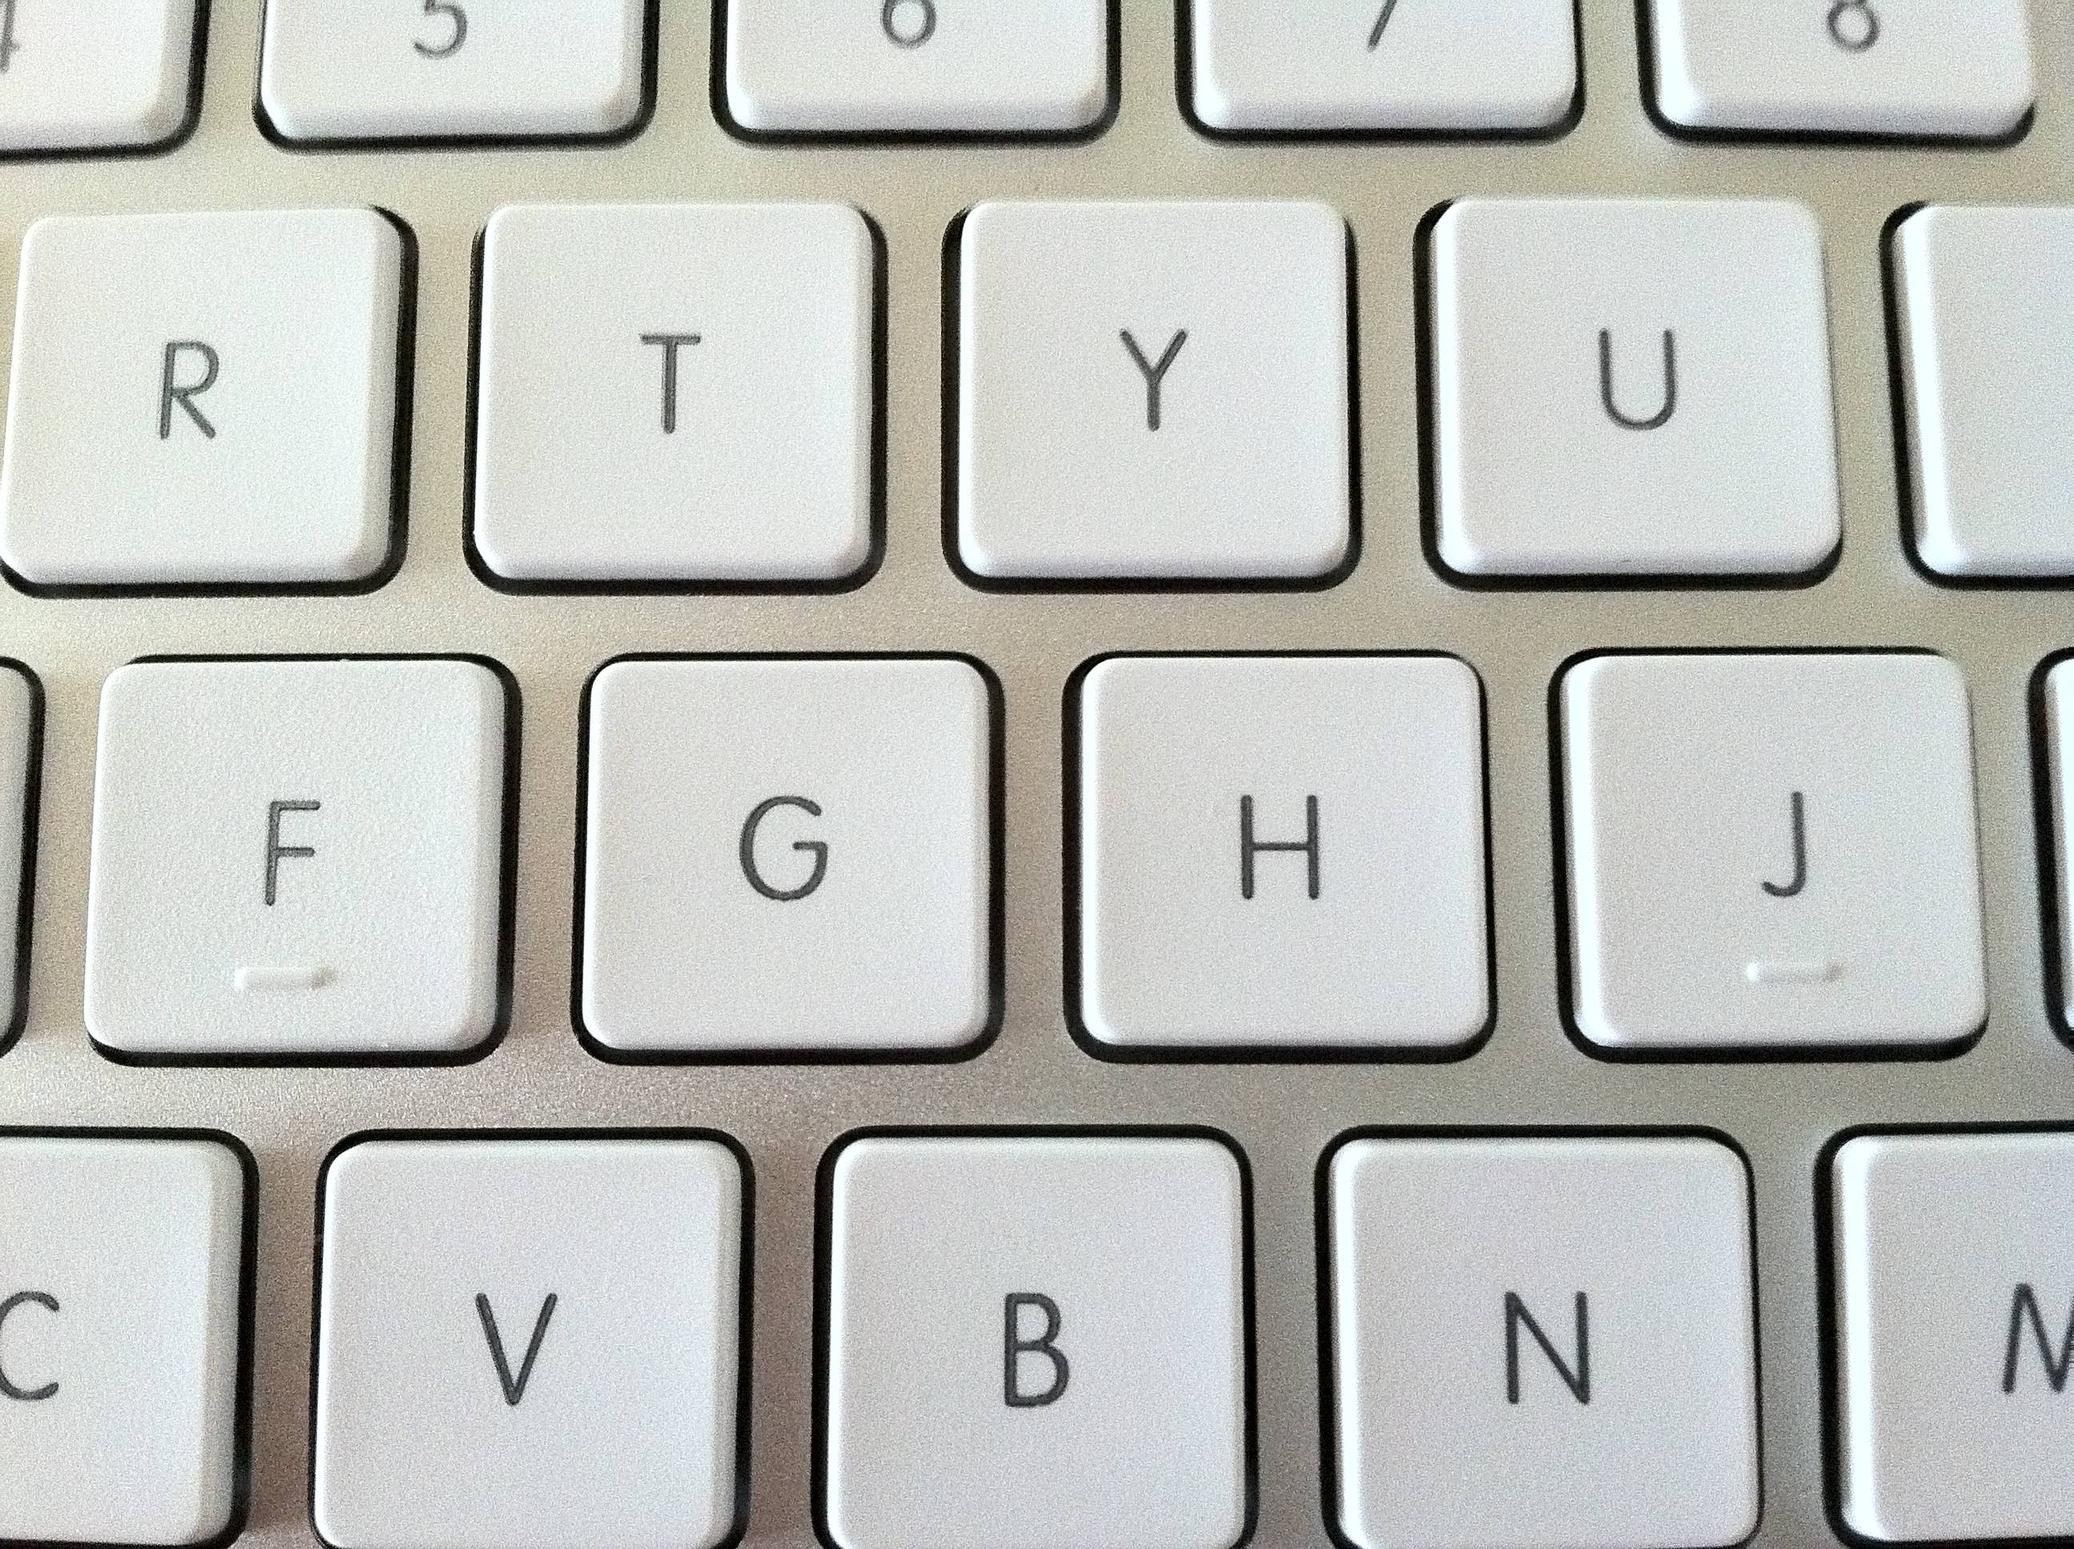 Keyboard Bumps